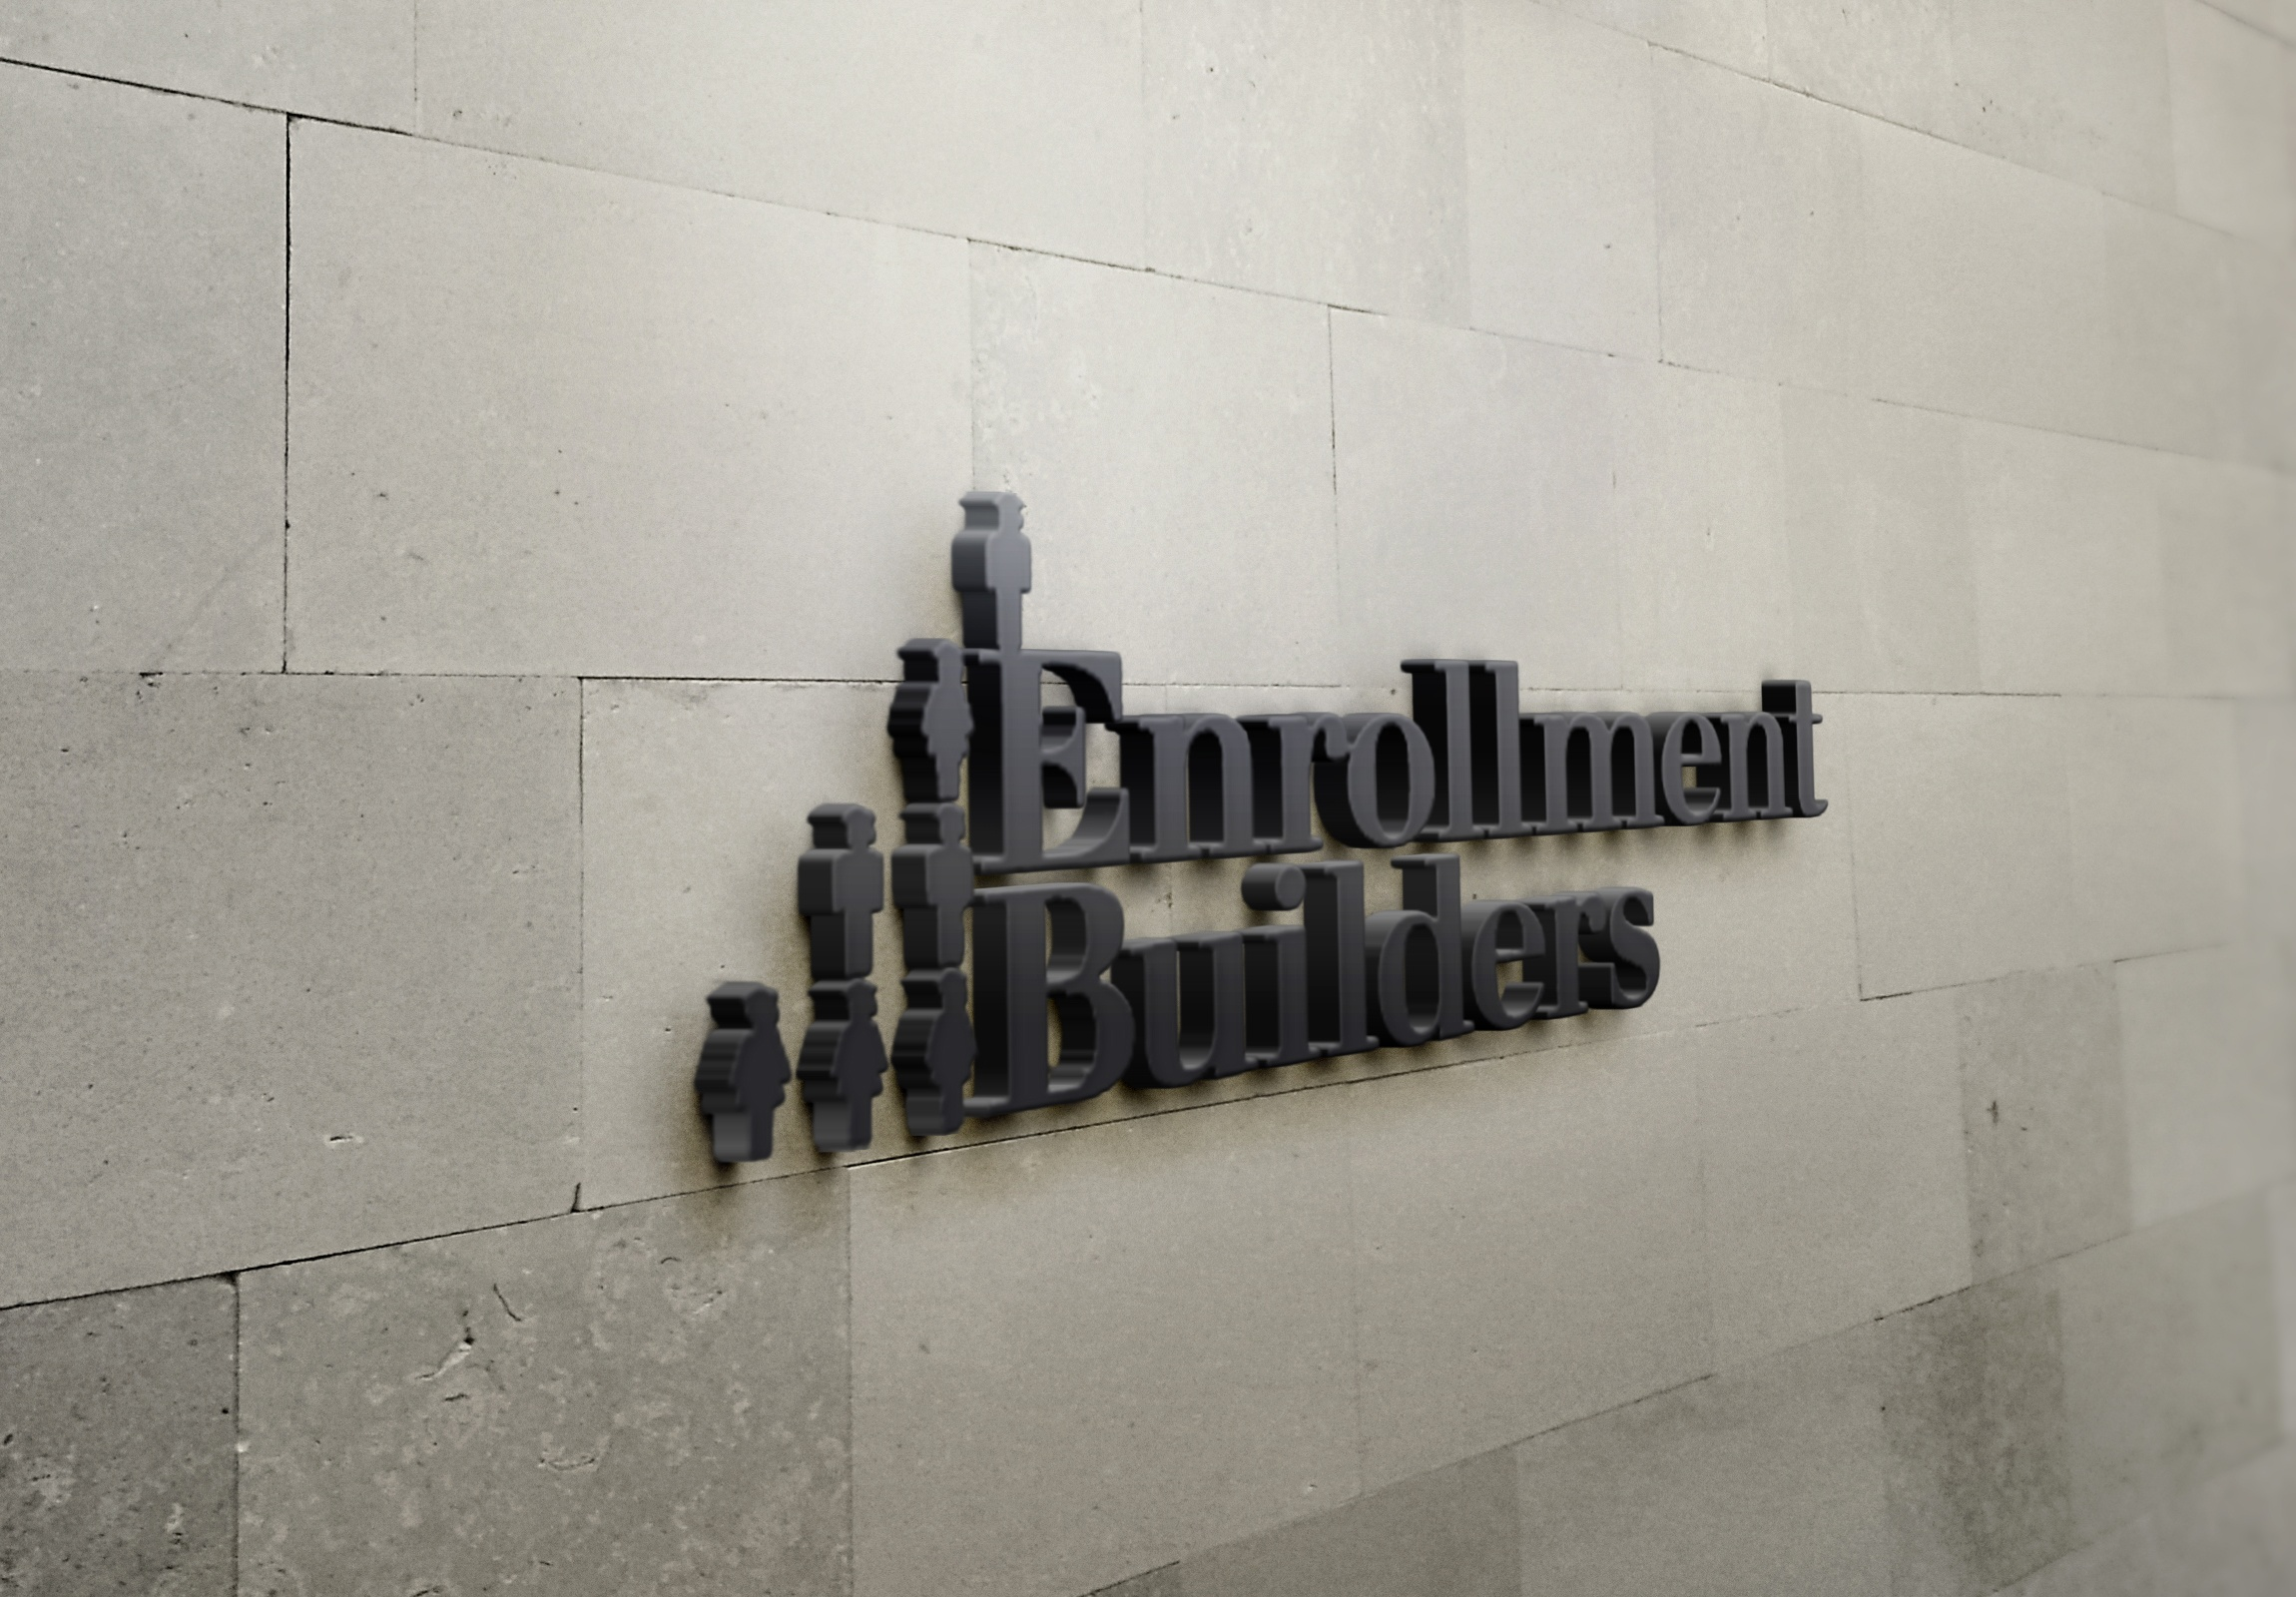 Enrollment_Builders_Wall